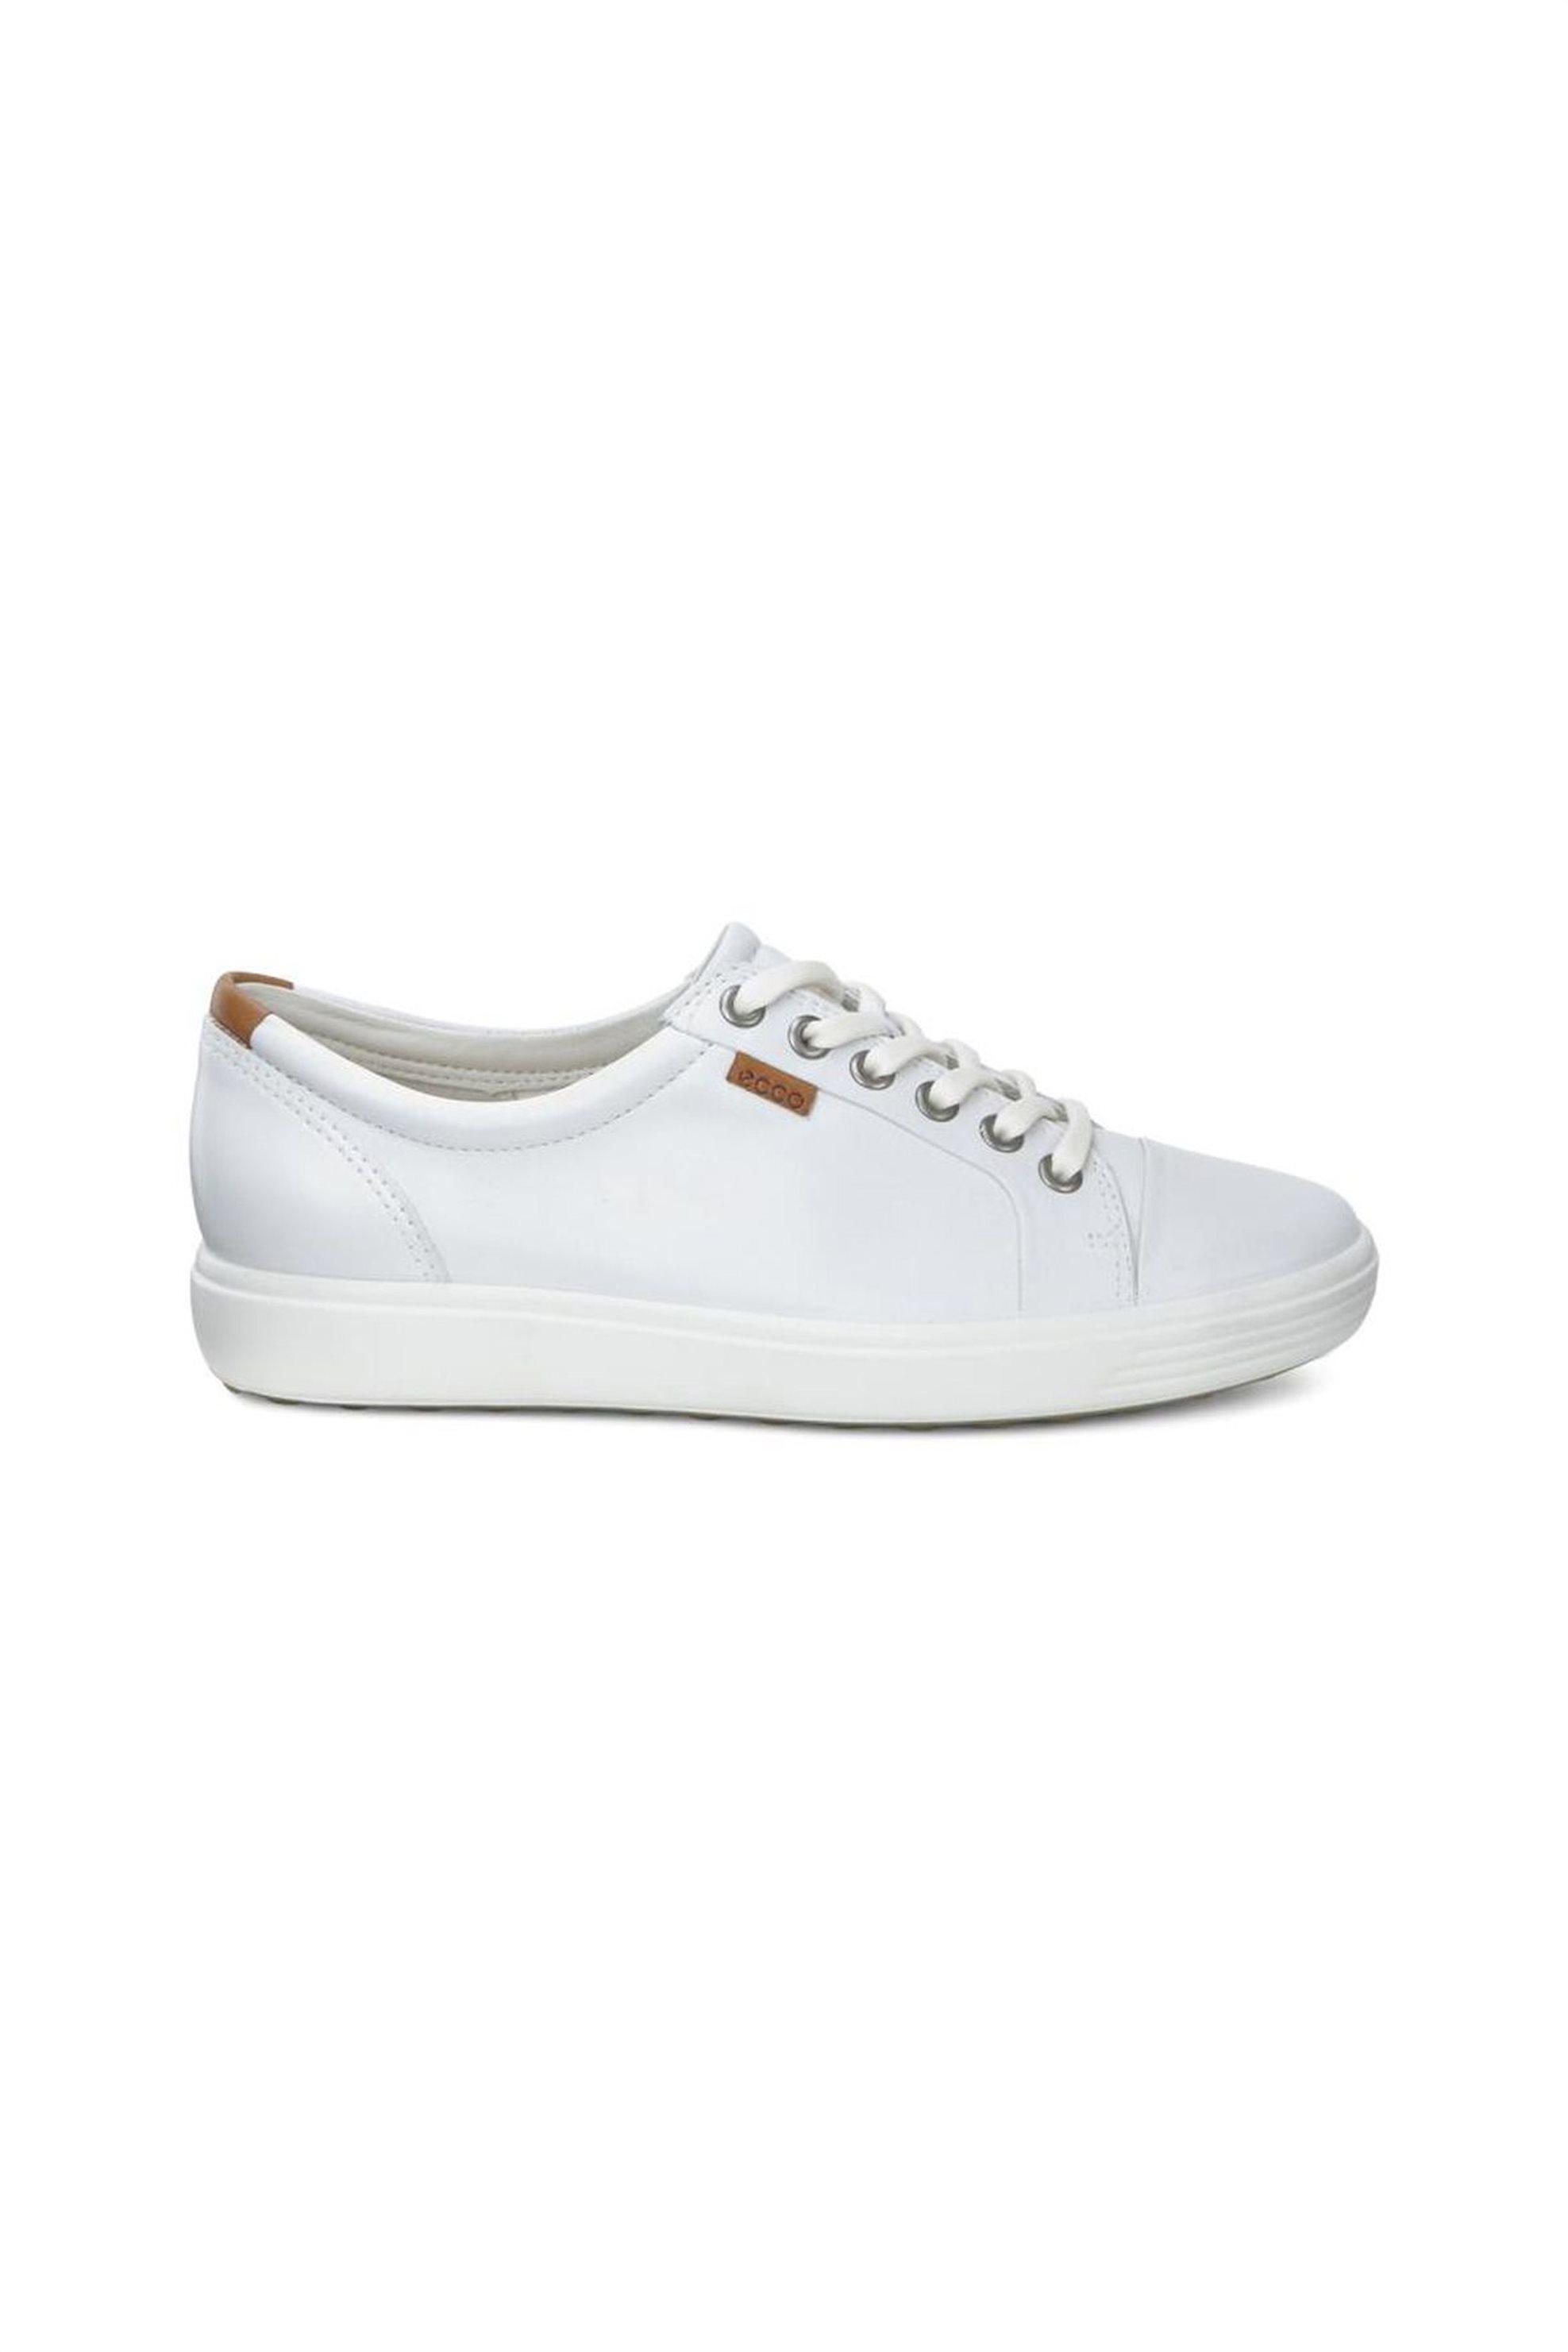 6250e41e1df -30% Notos Γυναικεία παπούτσια sneakers Soft 7 ECCO – – Λευκό